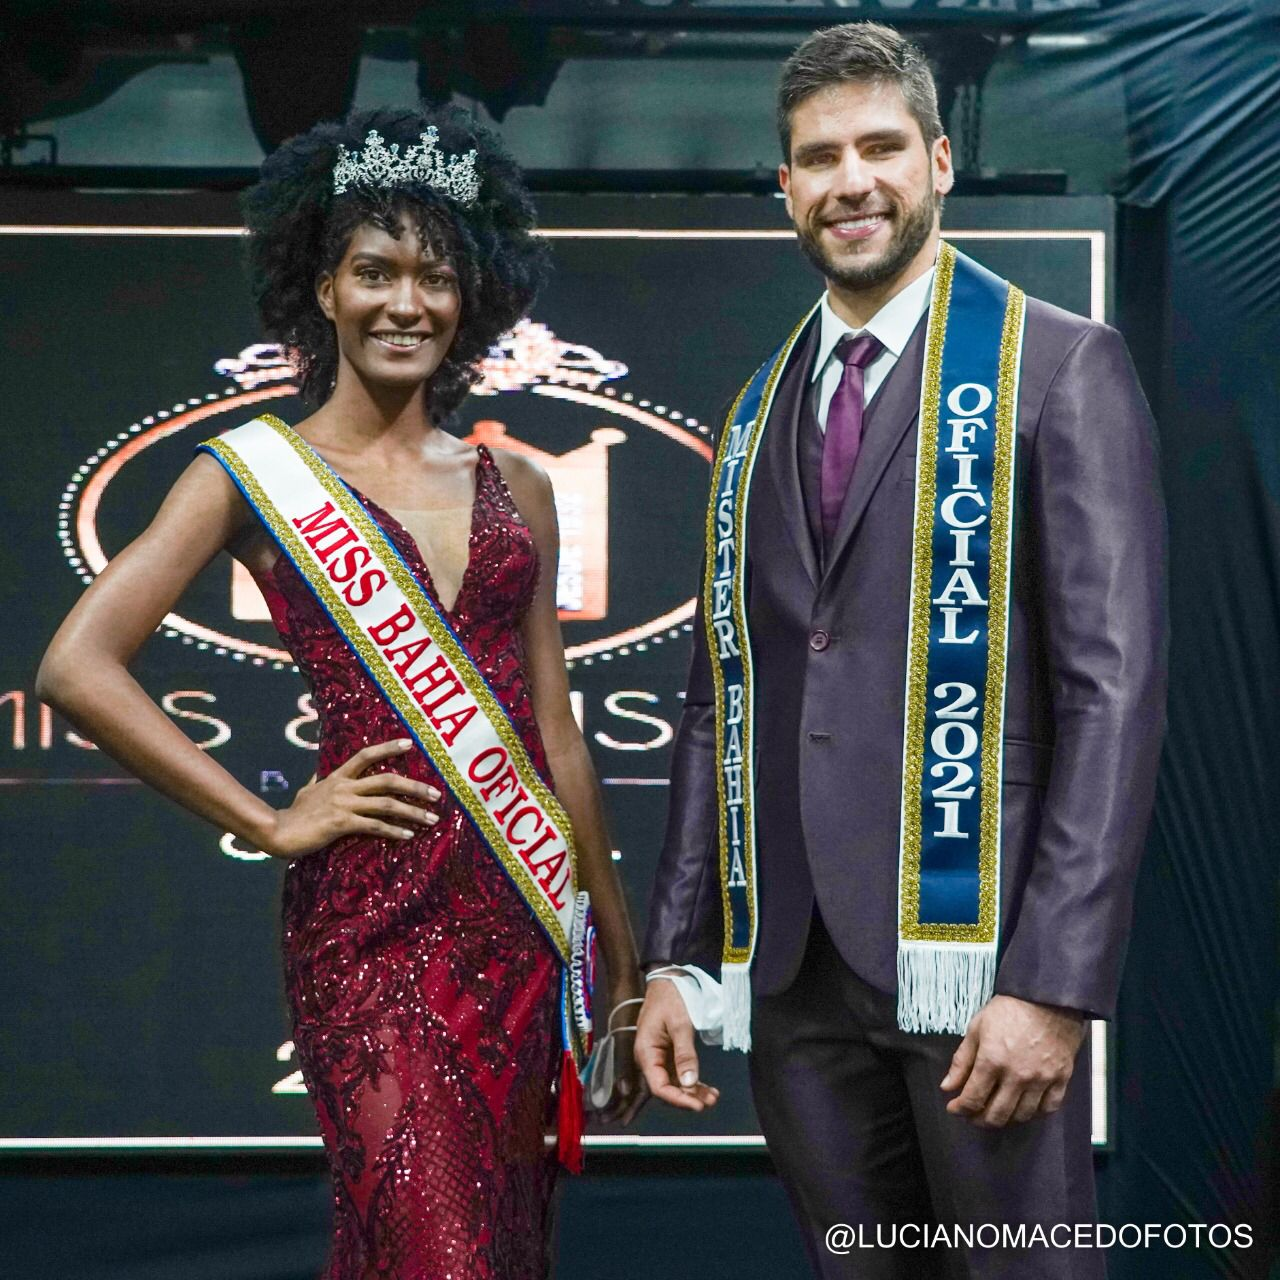 Lucas D´Ultra e Thulasi Hindra: Mister e Miss Bahia Oficial